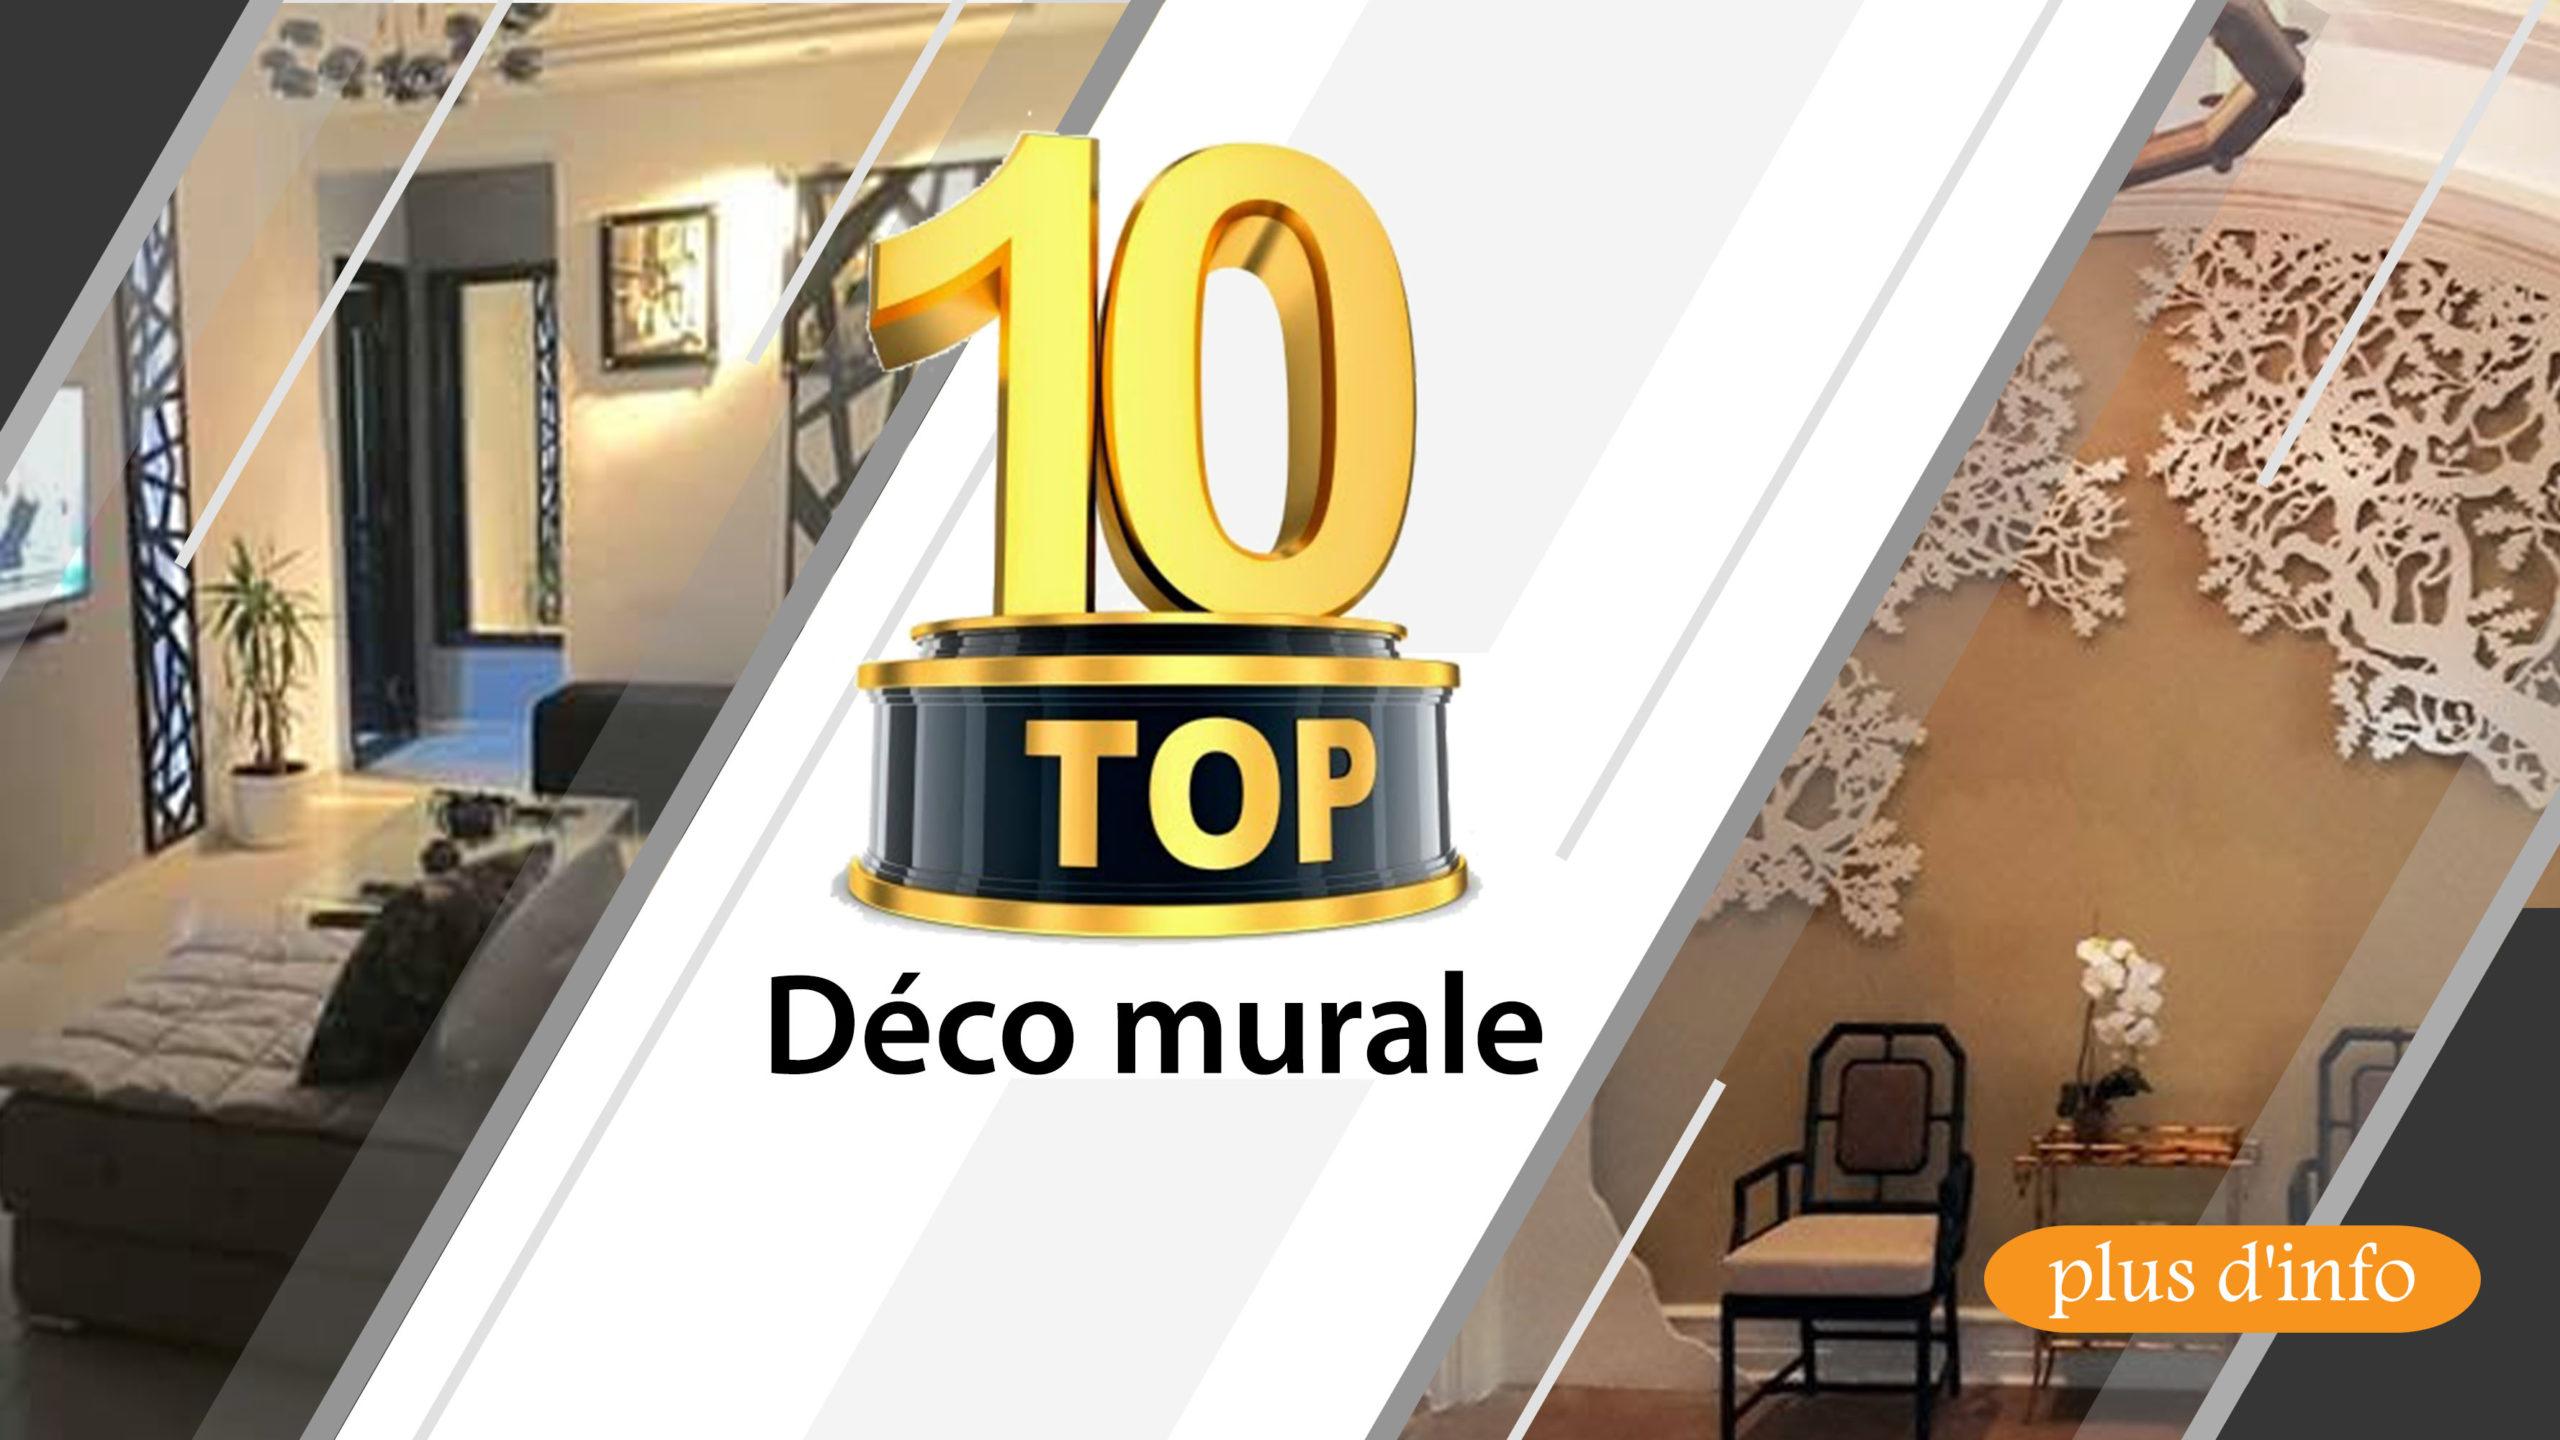 Top 10 Déco murale